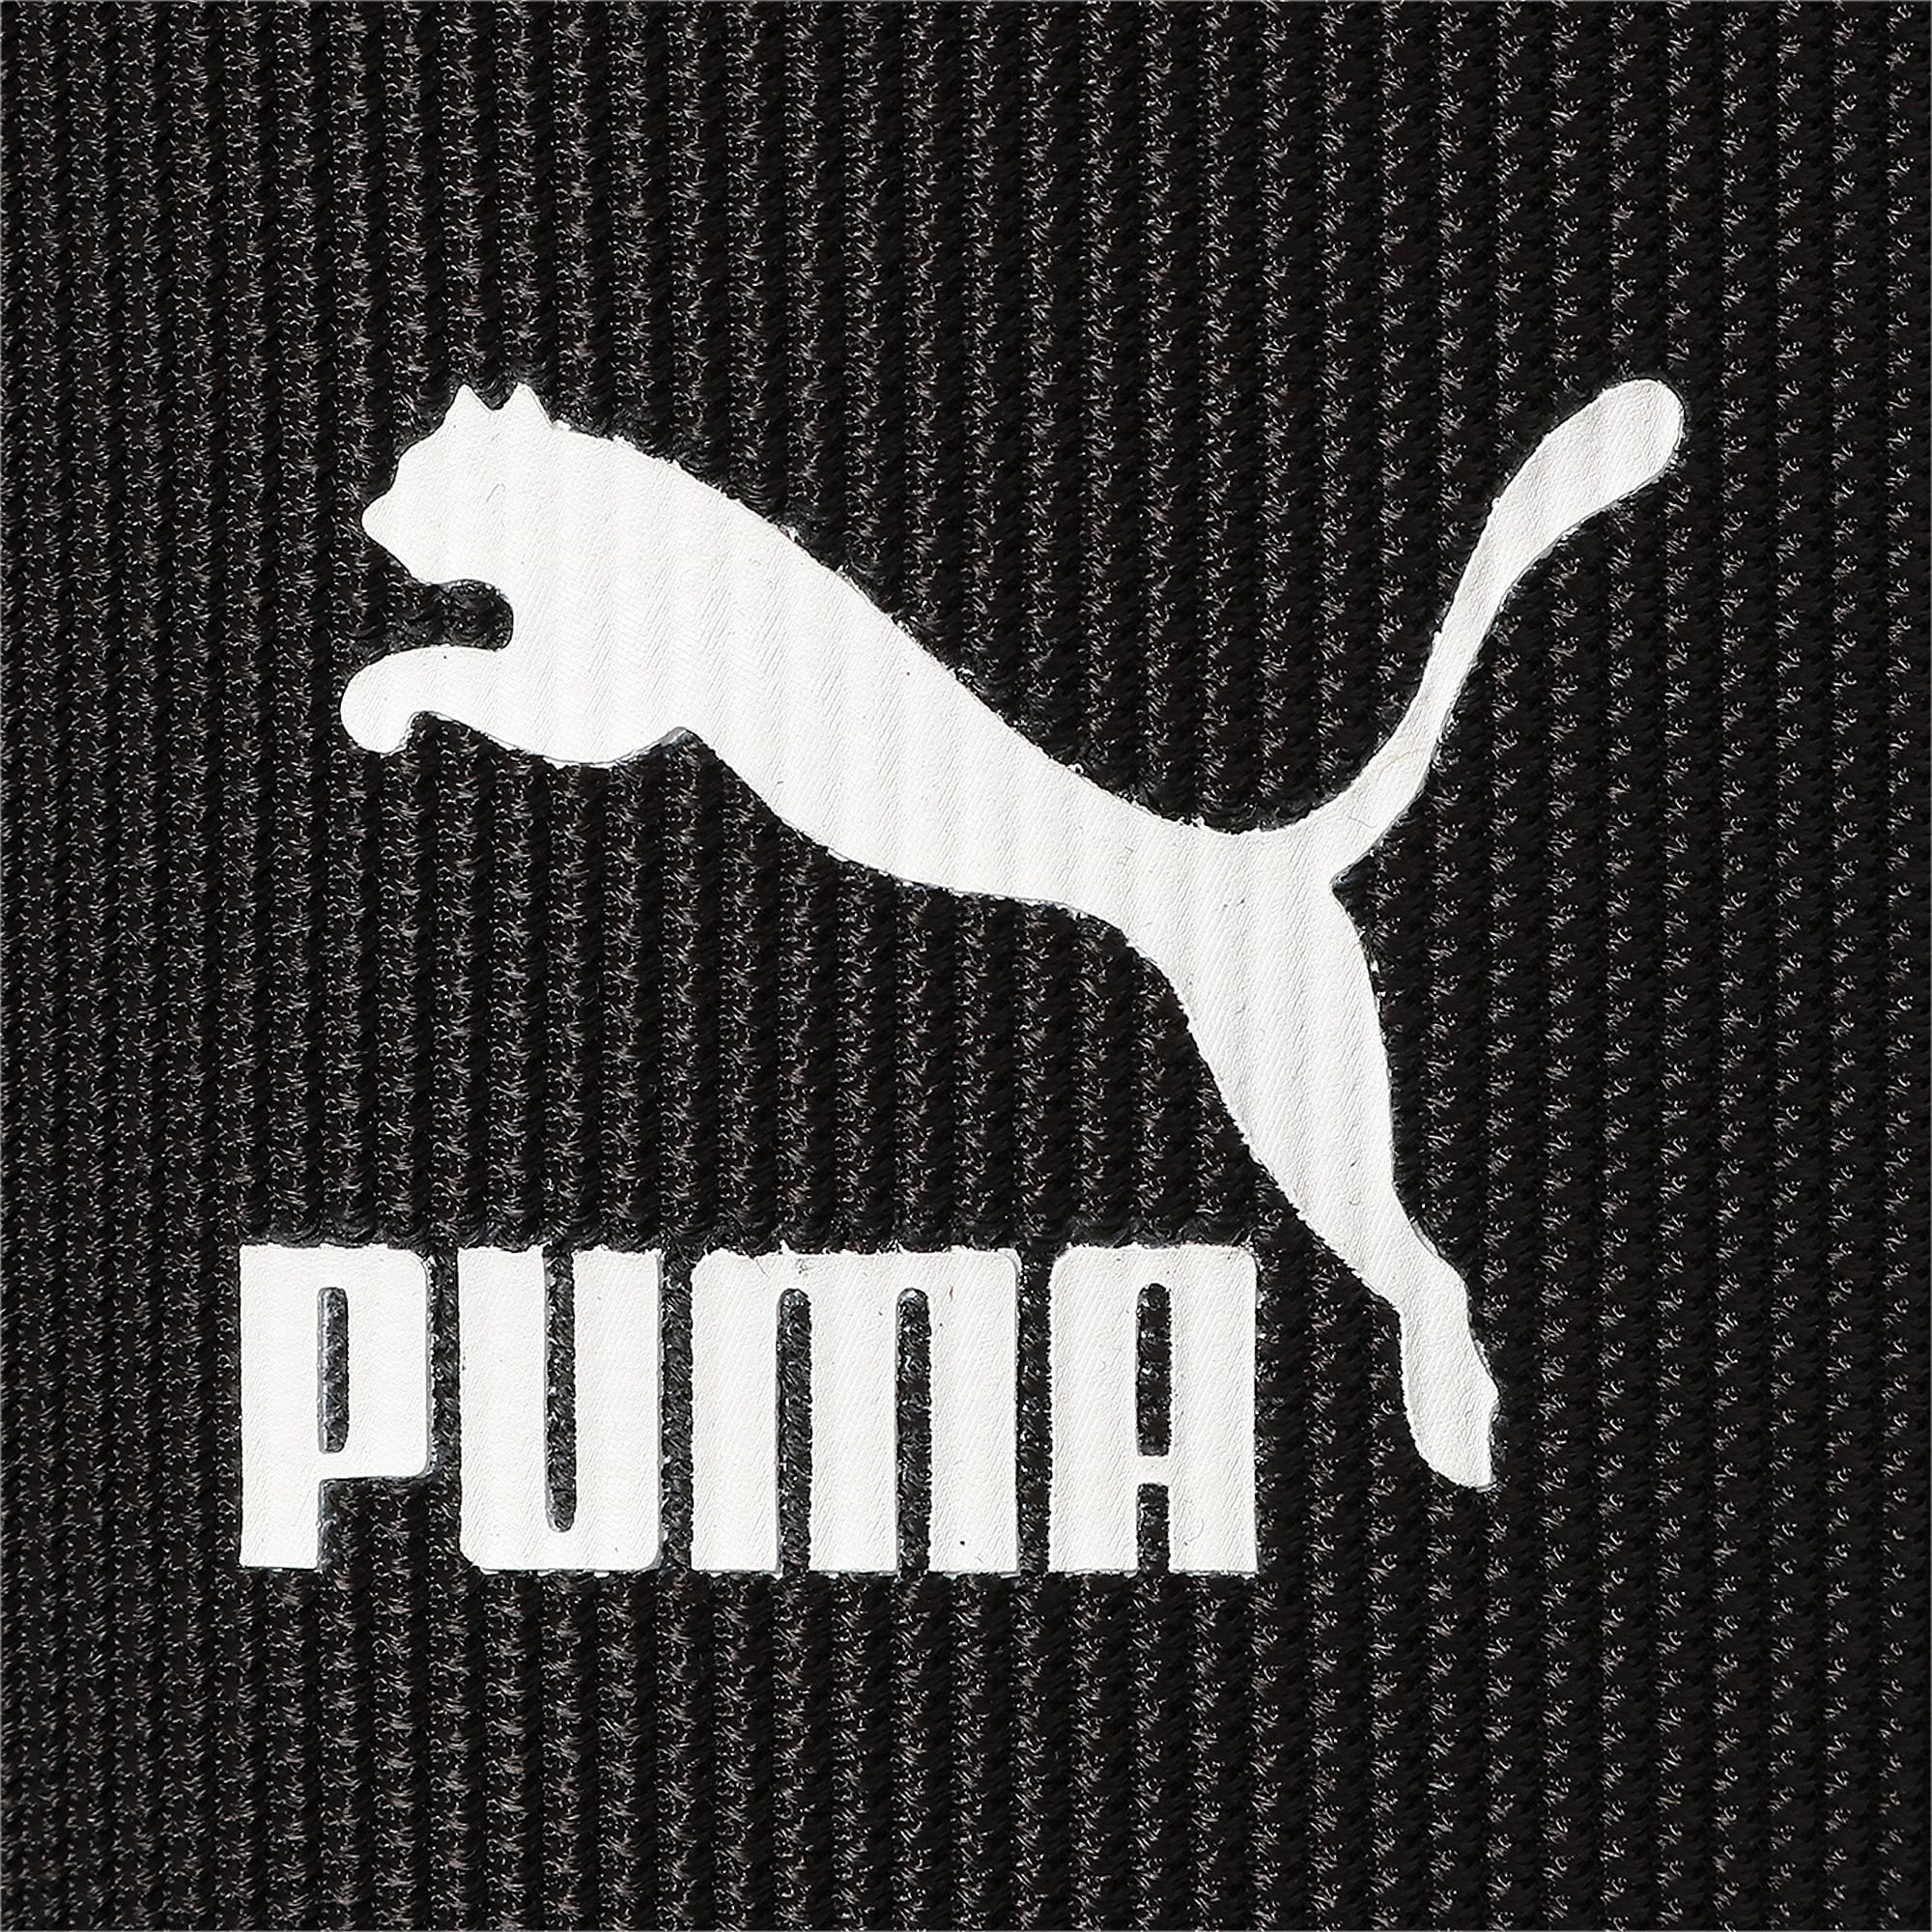 Thumbnail 7 of CLASSICS ウィメンズ リブ レギンス, Puma Black, medium-JPN